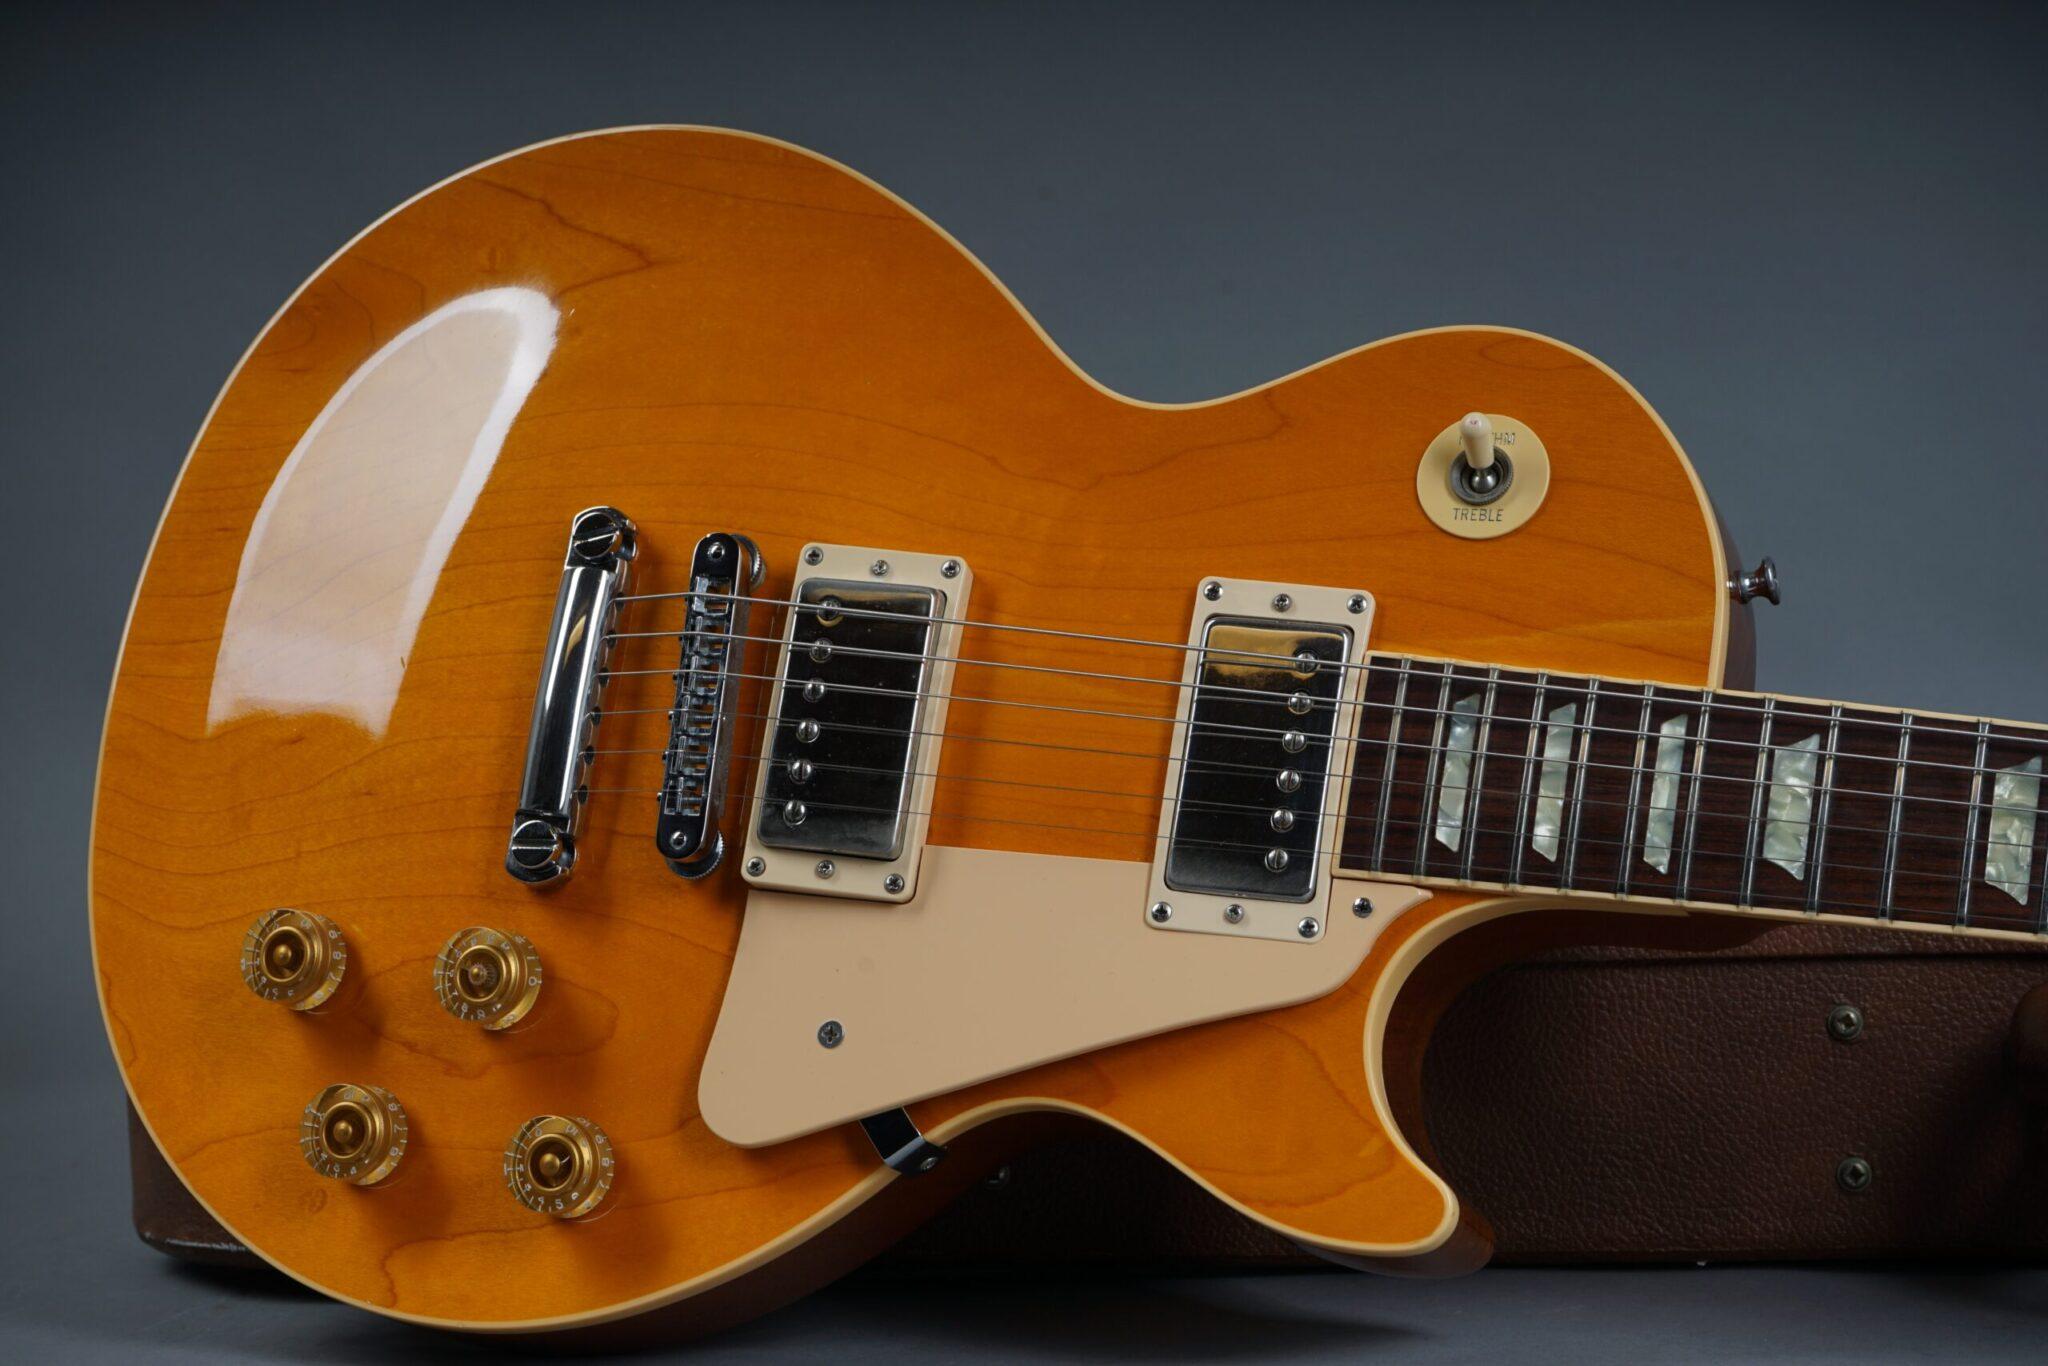 https://guitarpoint.de/app/uploads/products/1990-gibson-les-paul-standard-ltd-amber/1990-Gibson-Les-Paul-Standard-Natural-92360364-19-scaled-2048x1366.jpg